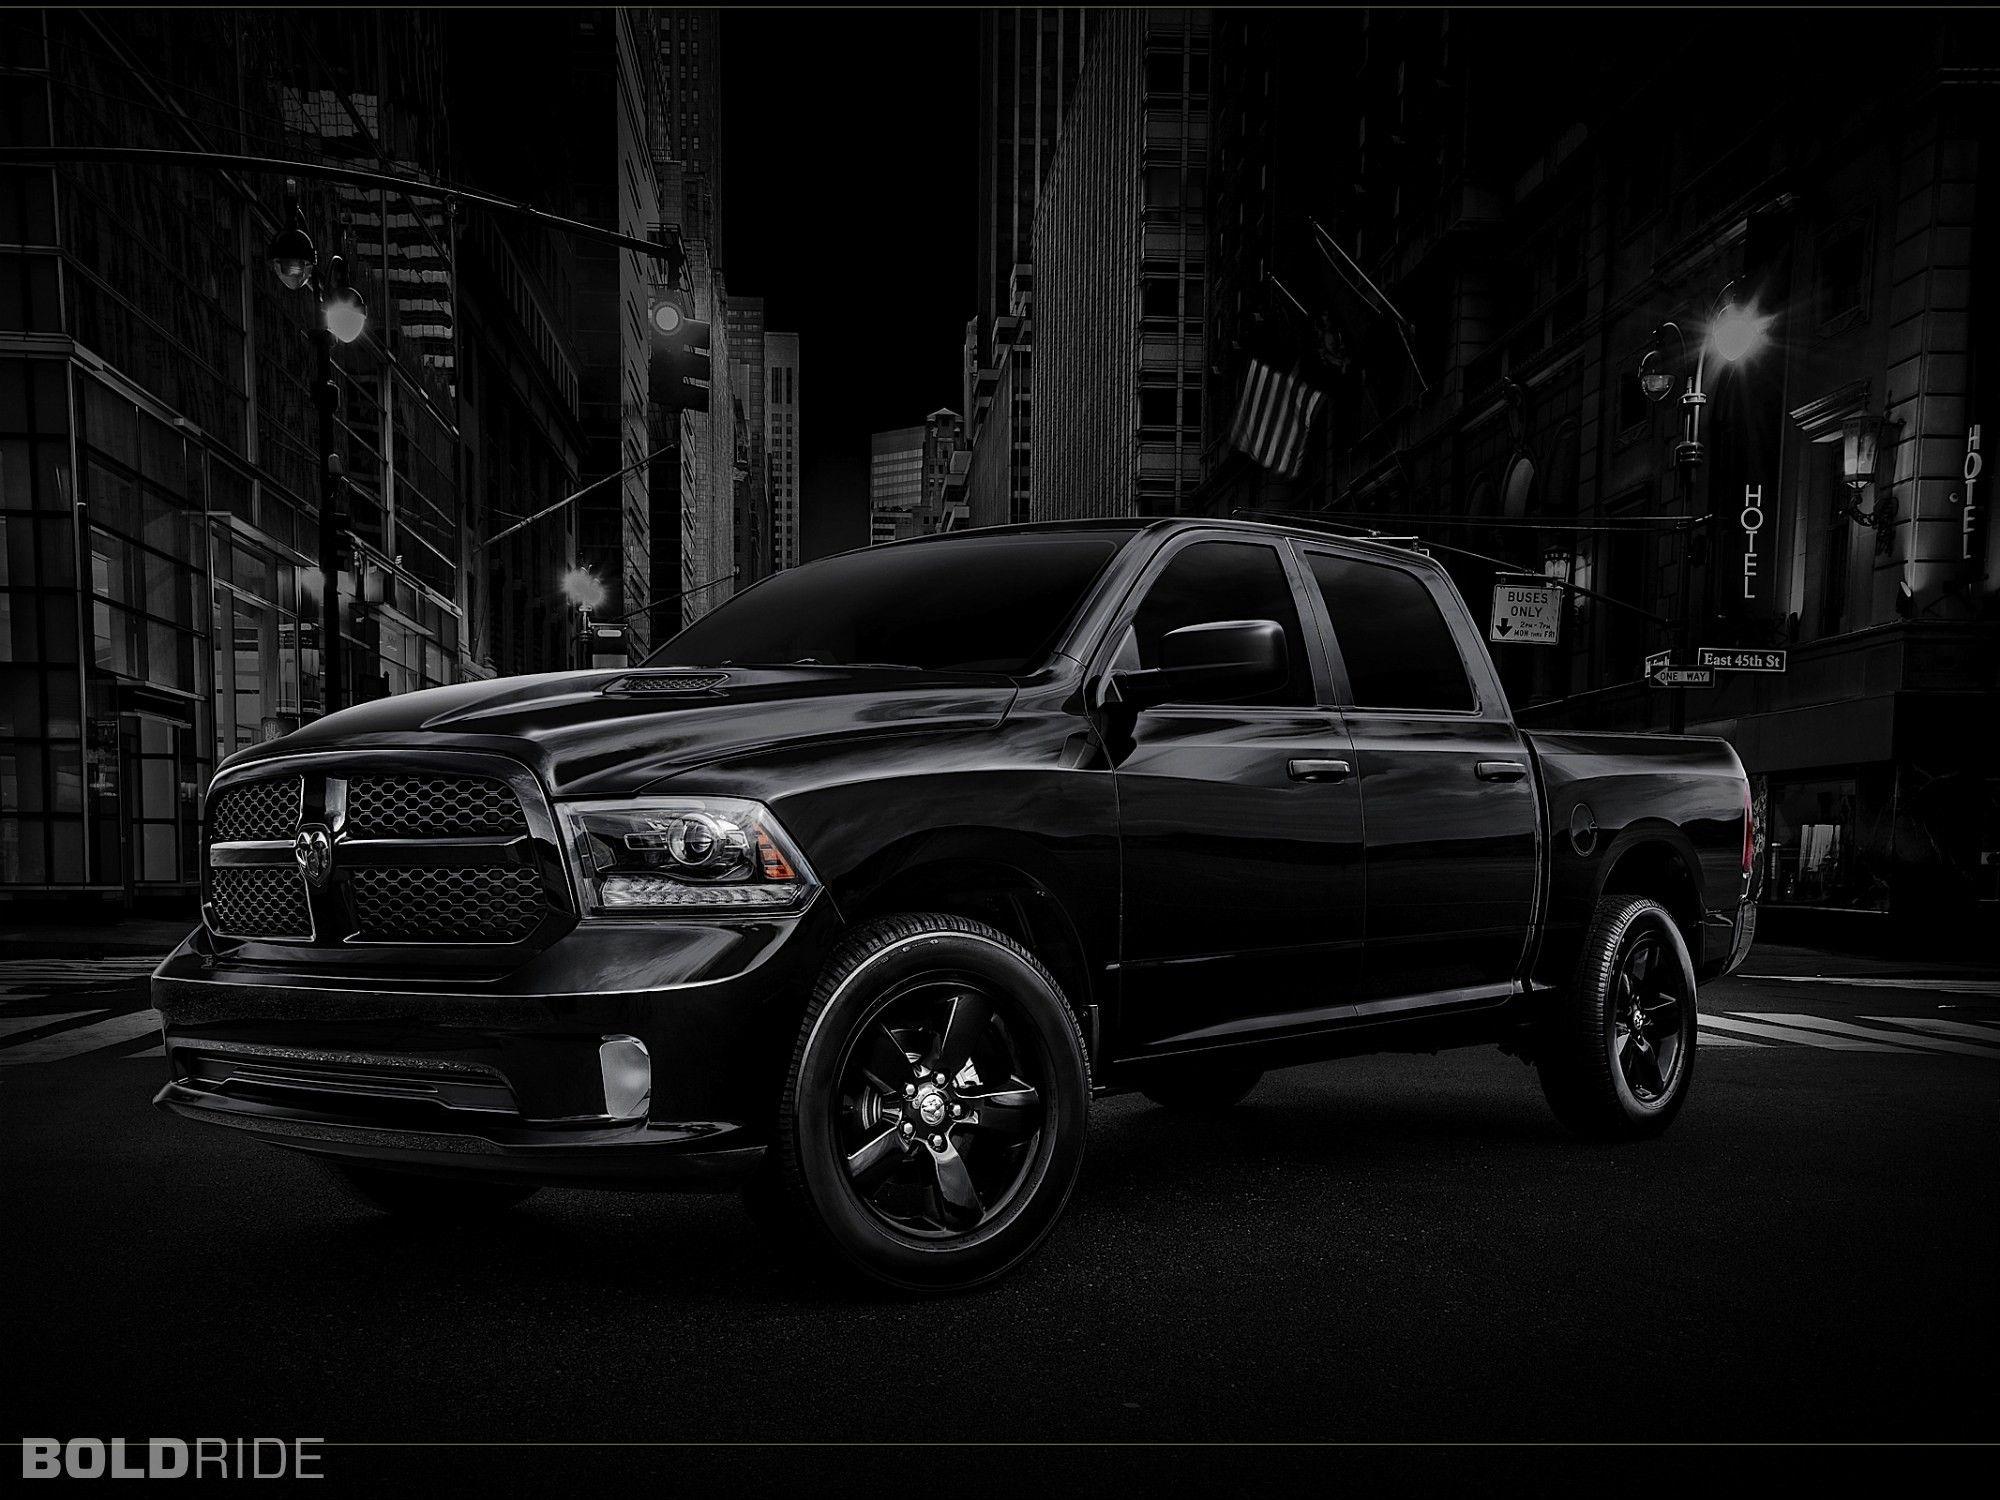 2000x1500 Dodge Ram Truck Wallpaper Wallpapersafari